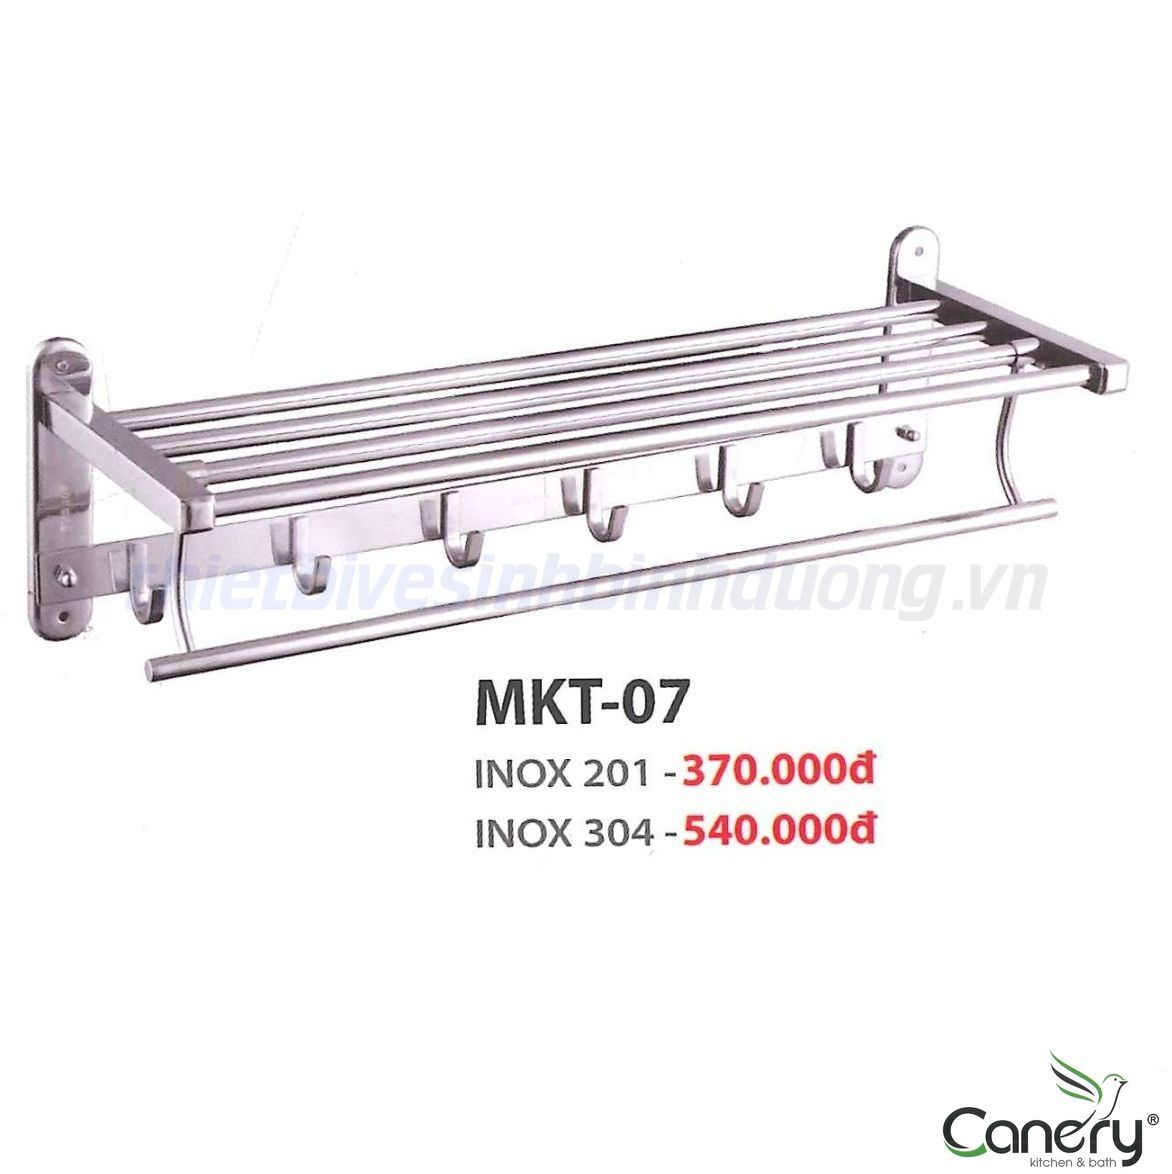 thanh-treo-khan-canary-mkt-07